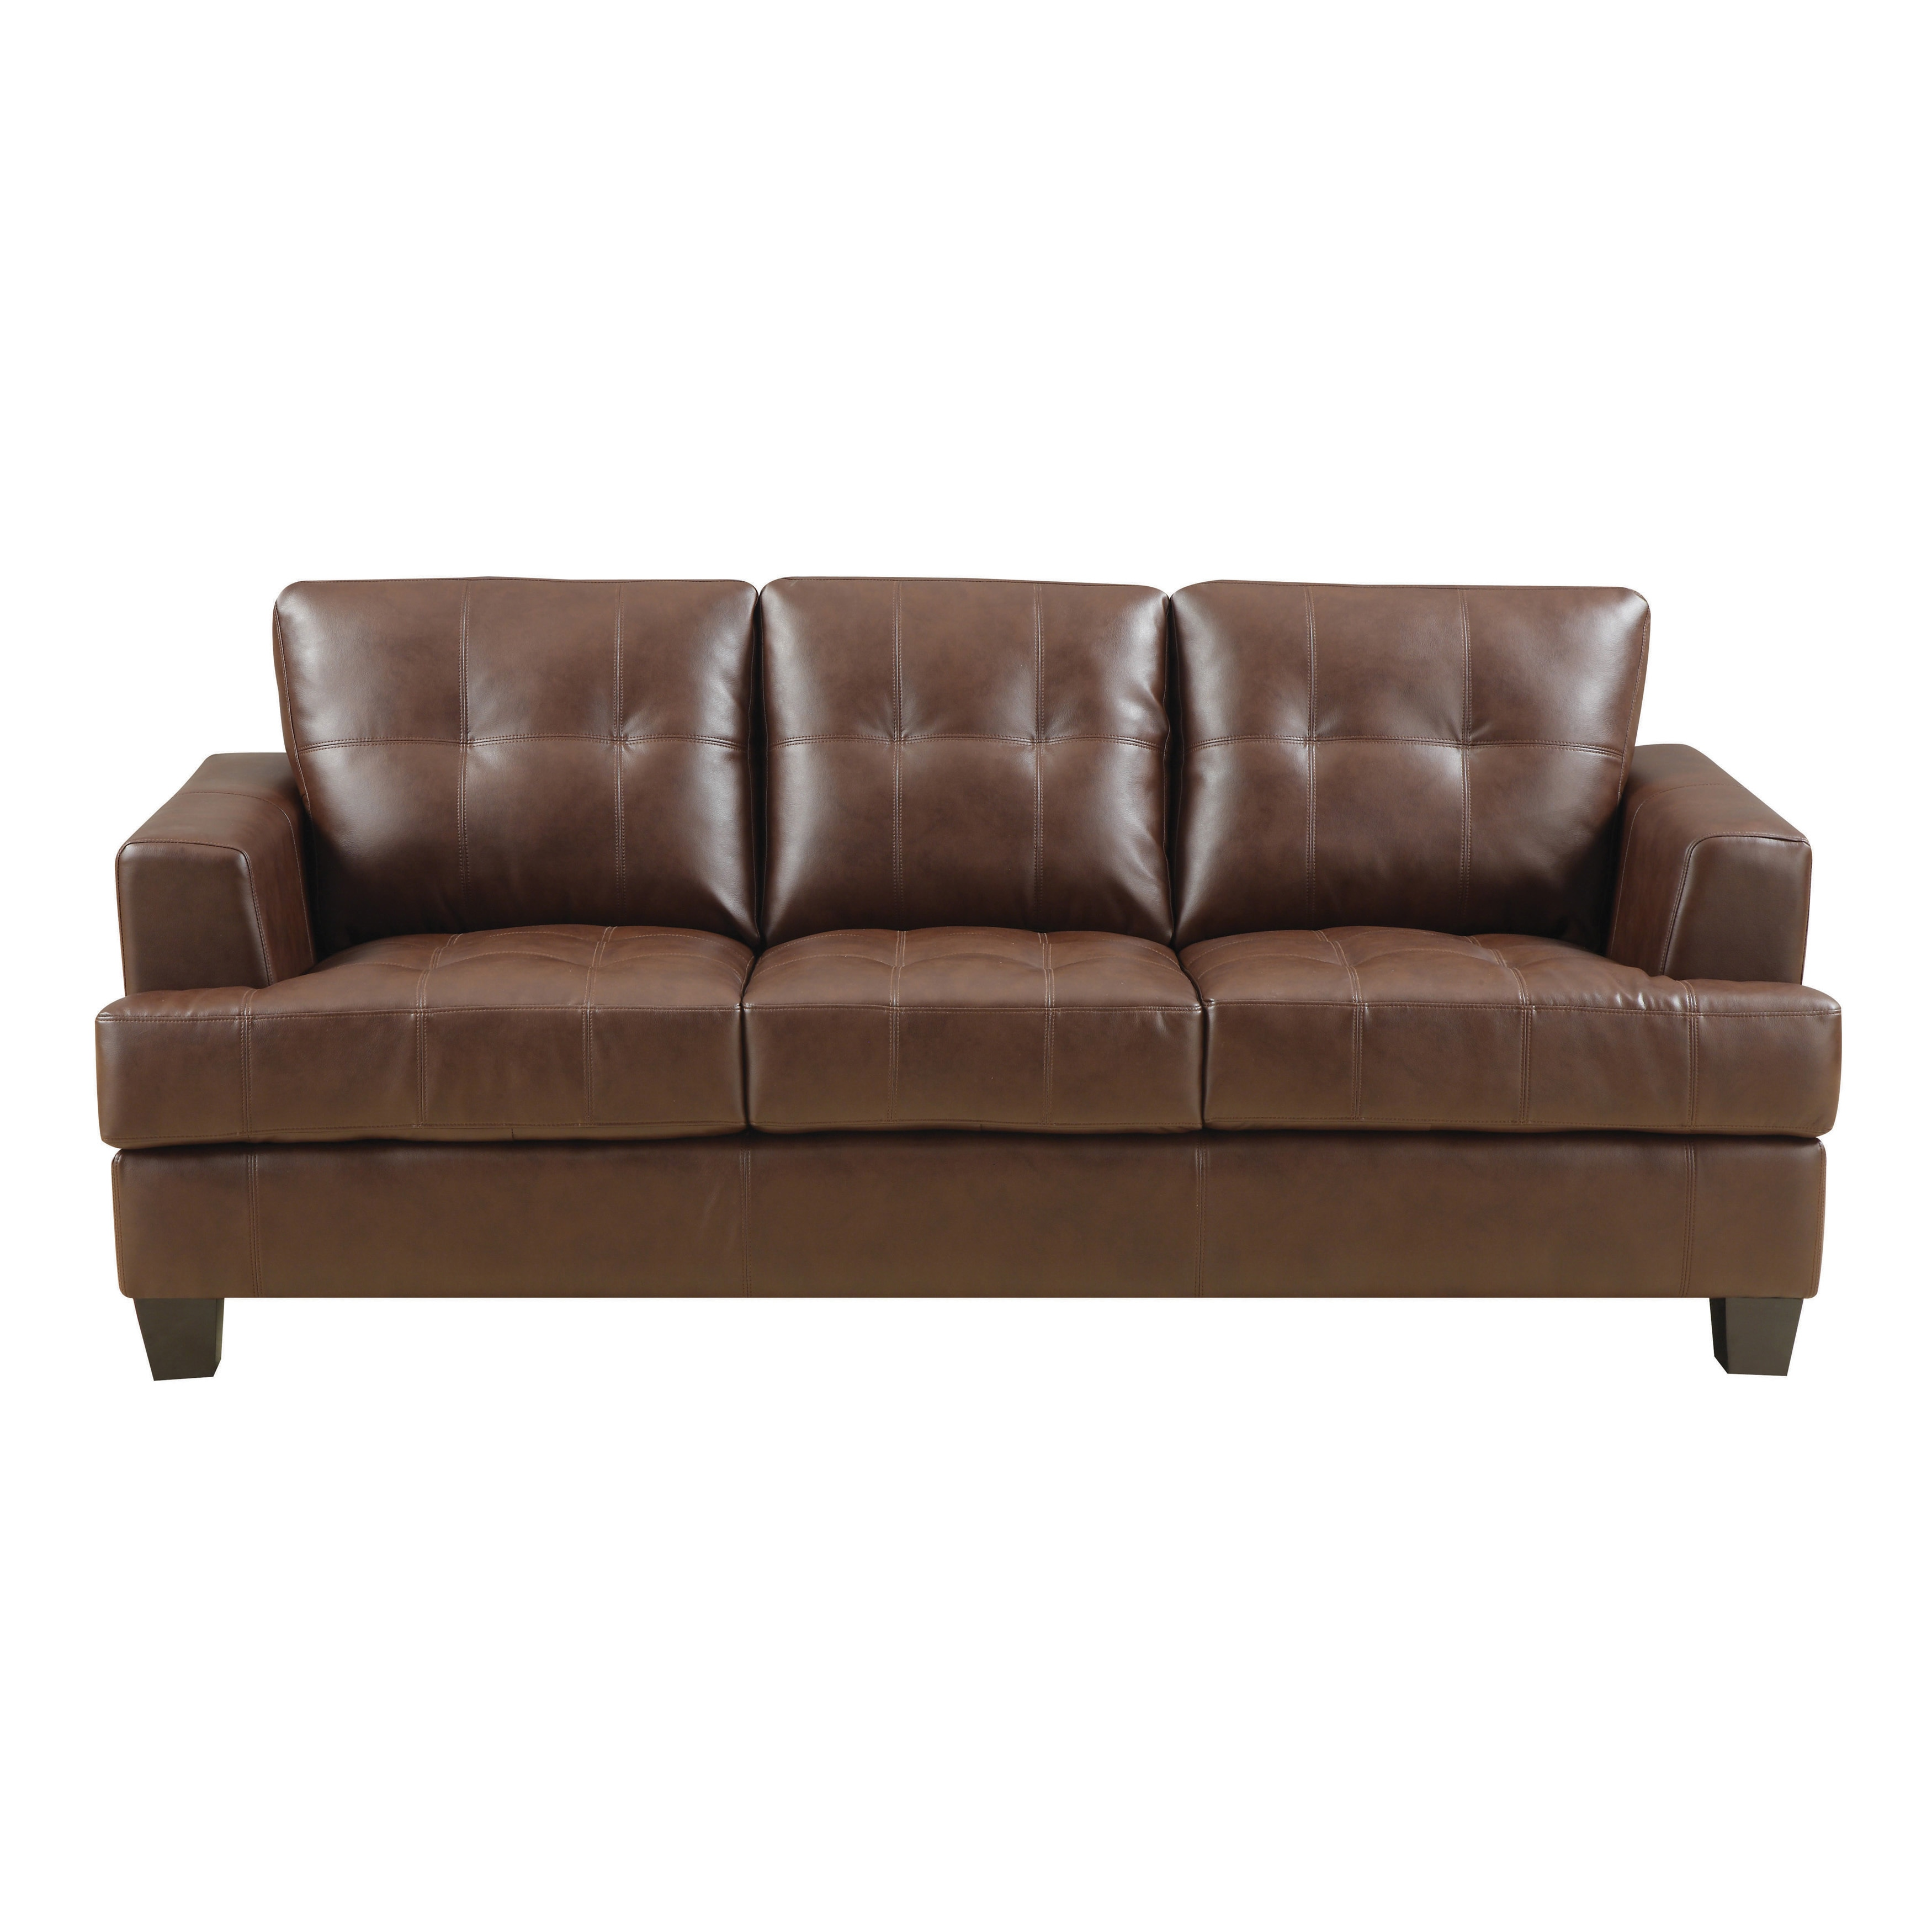 Shop Coaster Company Samuel Contemporary Bonded Leather Sofa - On ...